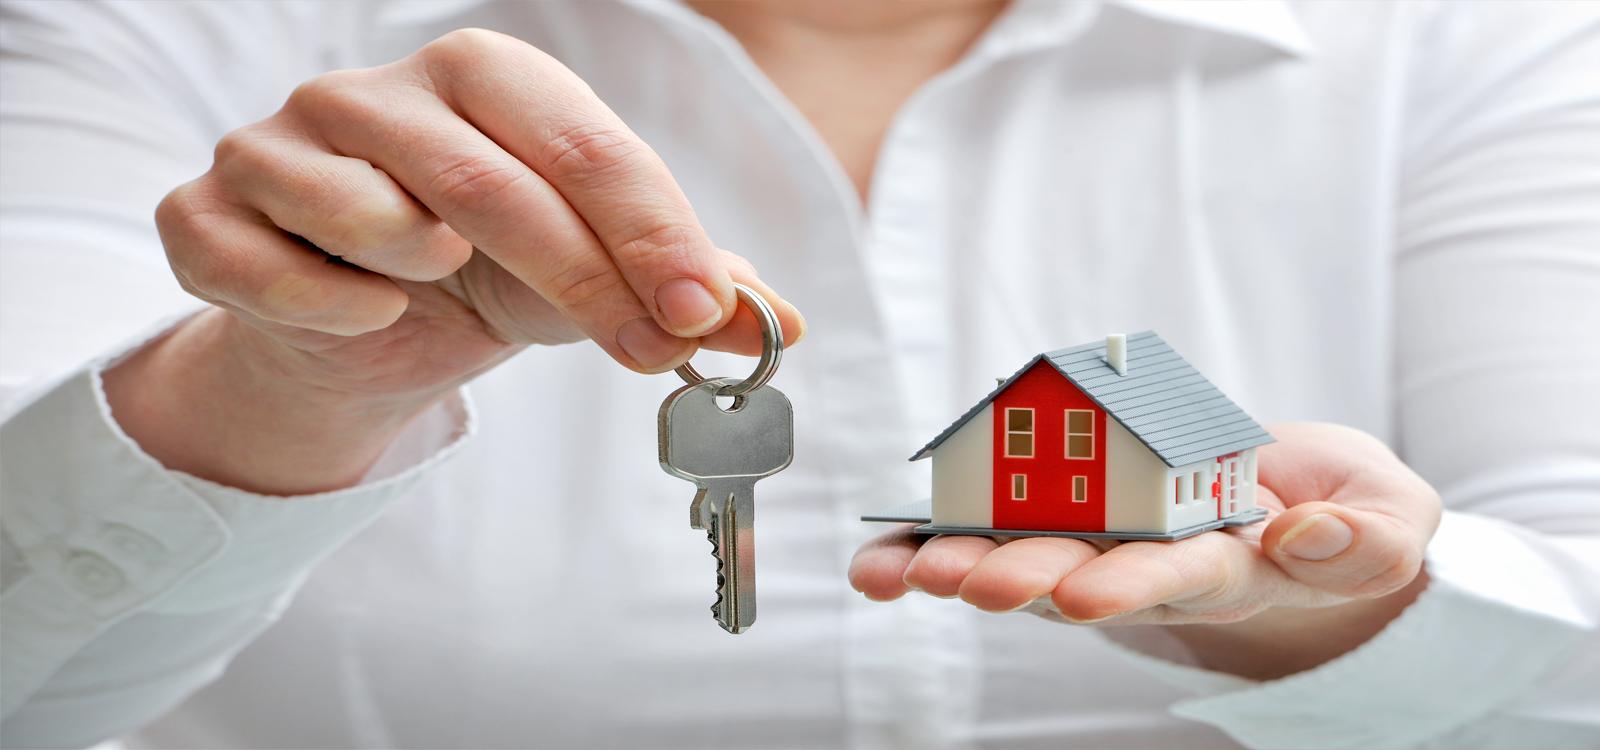 Cr dit immobilier descreditsenligne com - Erreur credit immobilier ...